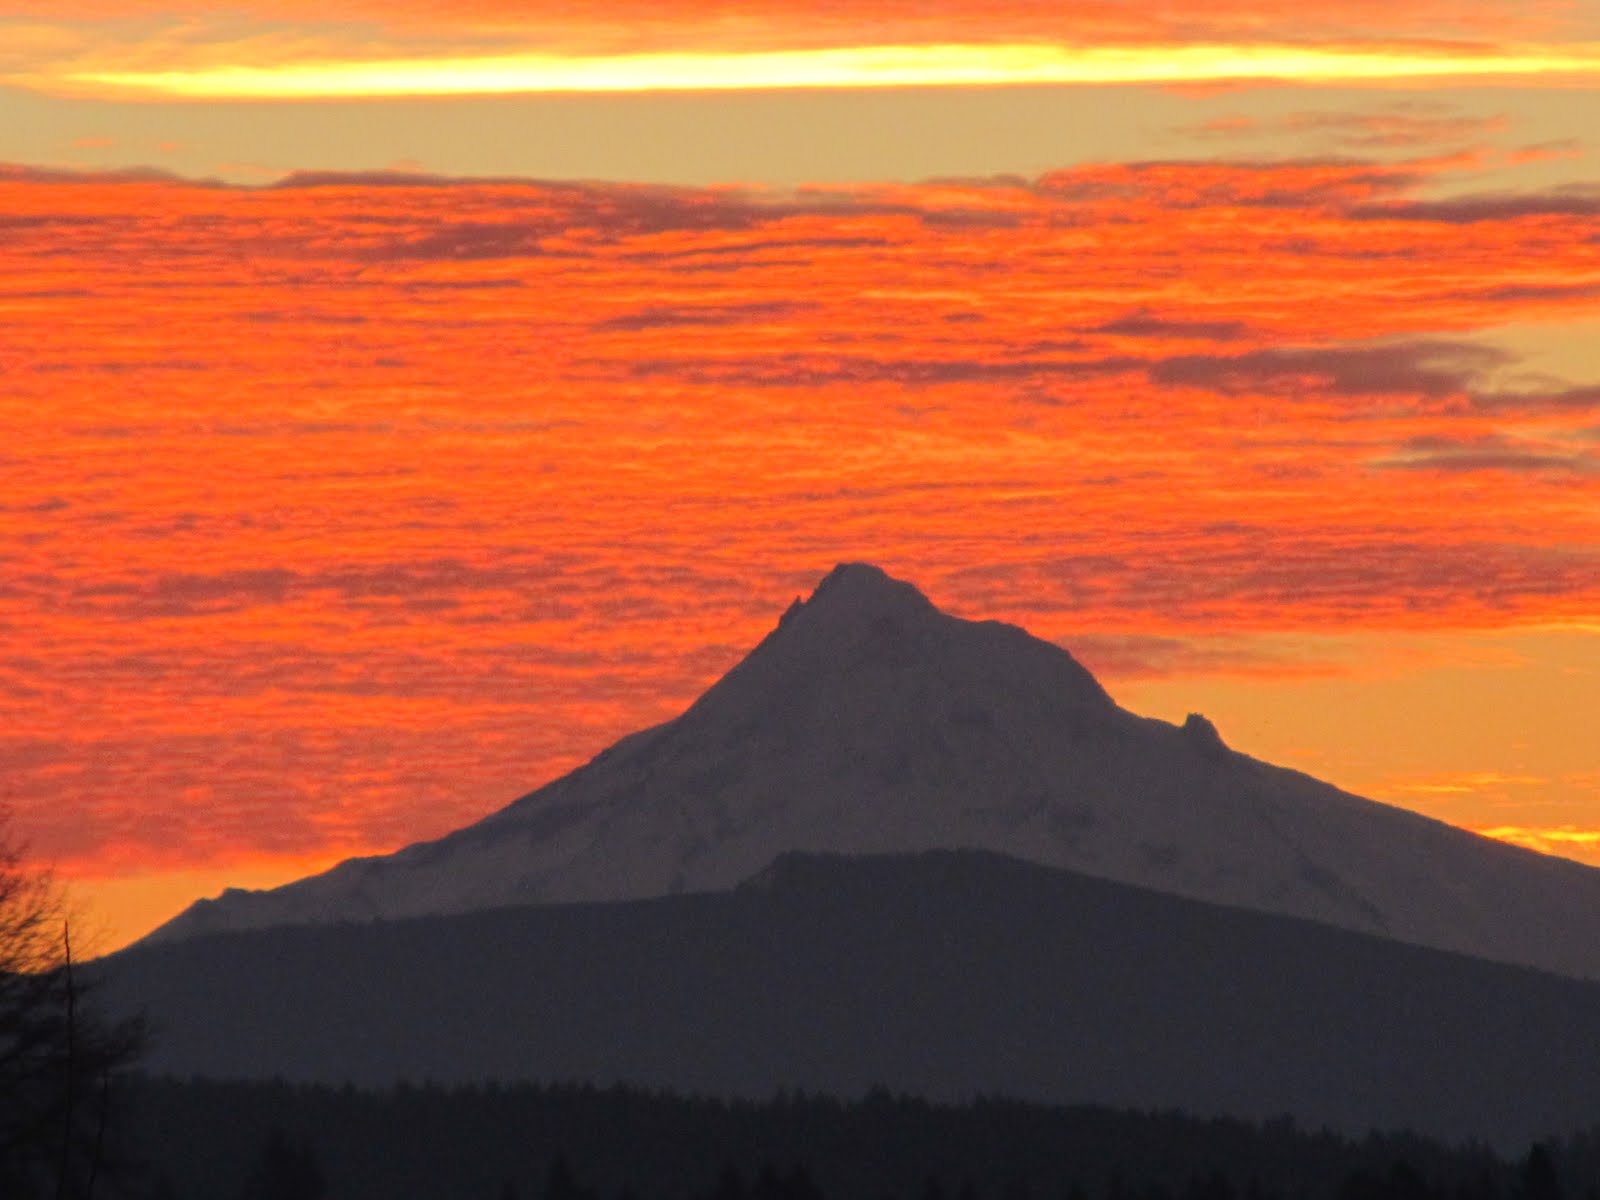 http://3.bp.blogspot.com/-ZgEb8JgexFY/TxJs0rI4jiI/AAAAAAAABpY/7xmdkMIUJk4/s1600/Mt.+Hood+Sunrise+2012.JPG